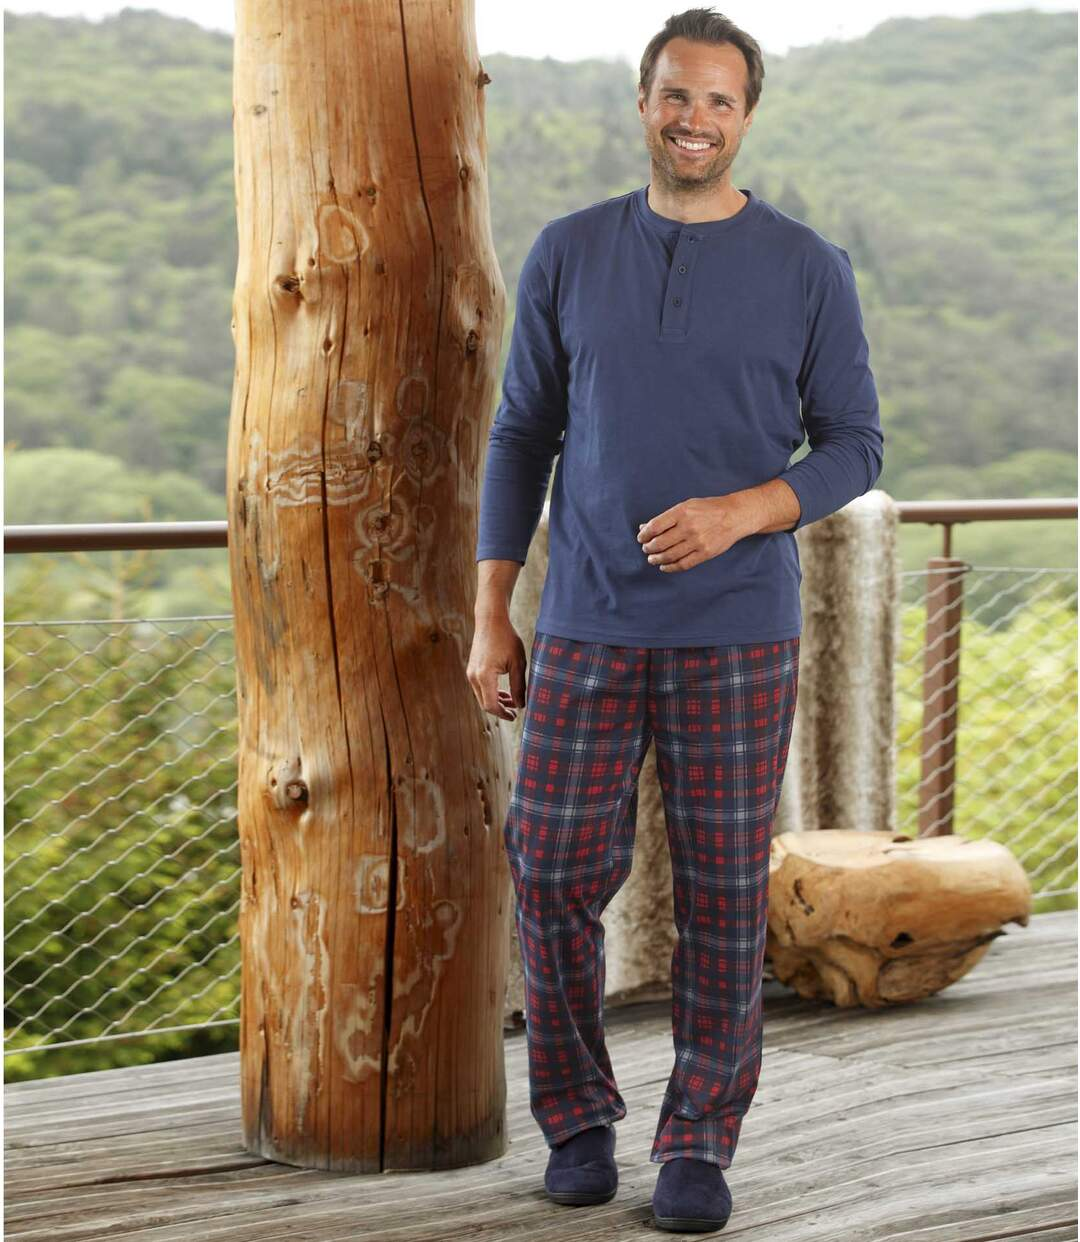 Katoenen pyjama in Engelse stijl